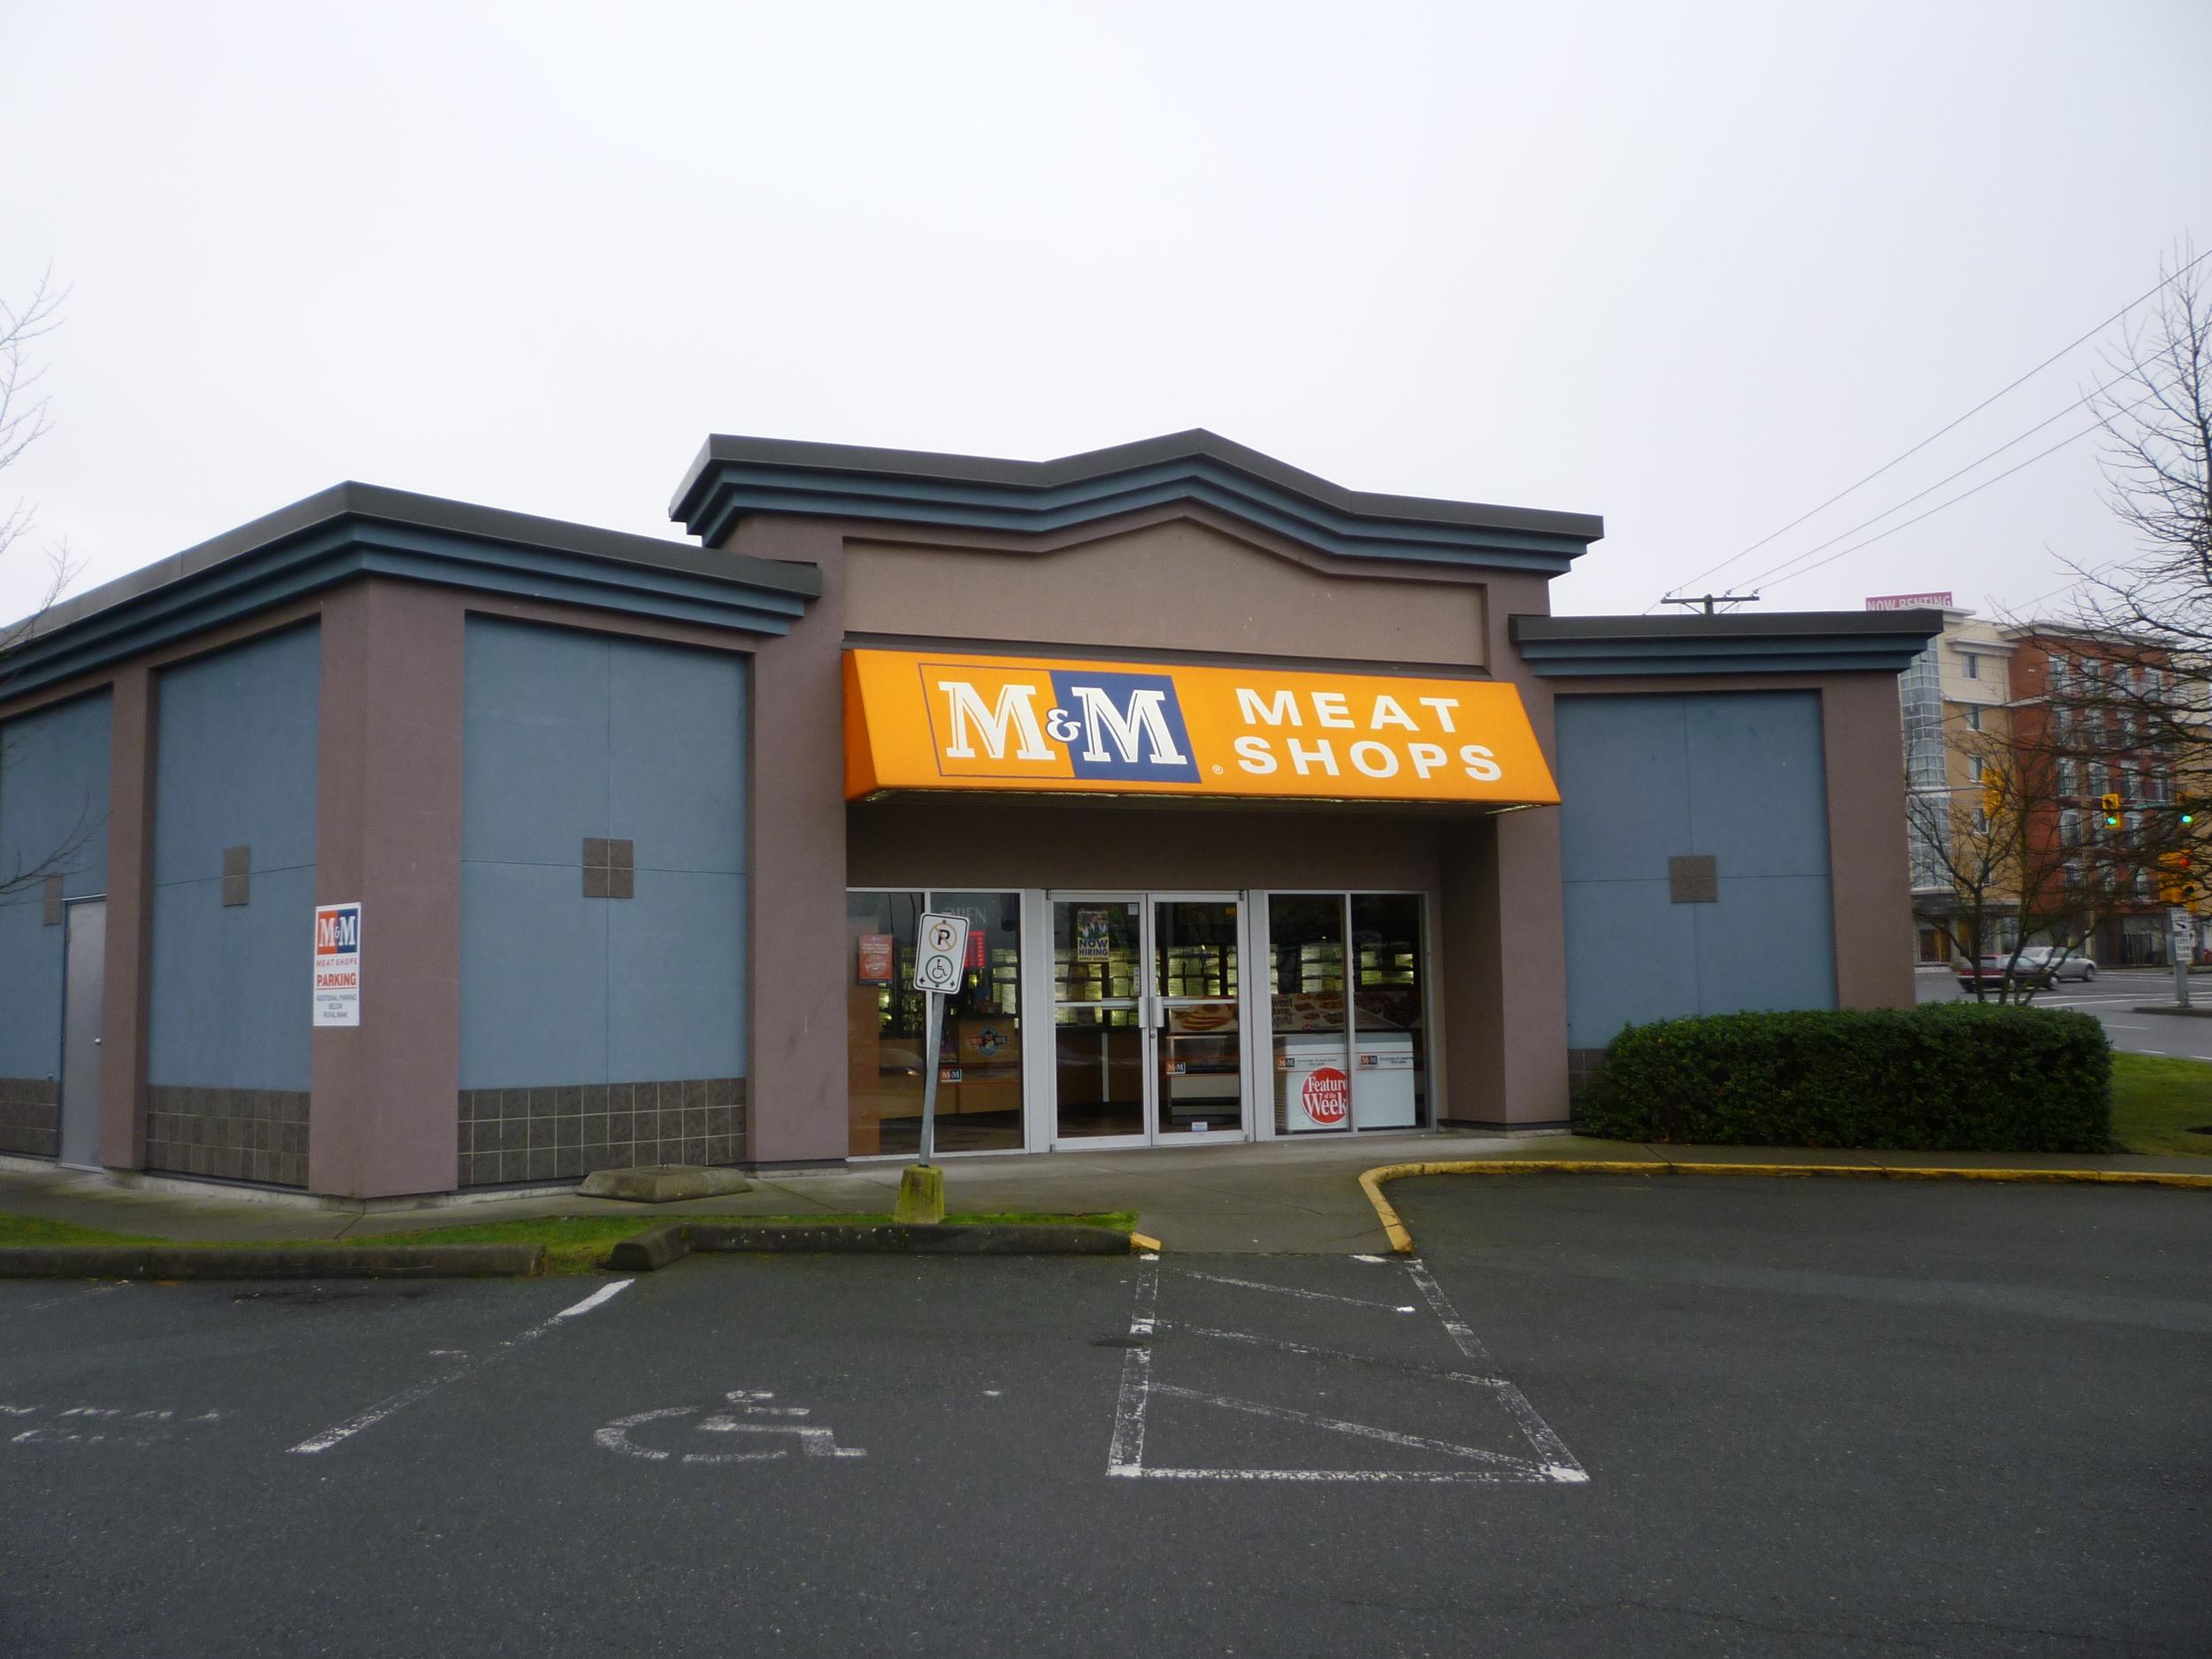 M&M Meat Shop Burnside Road